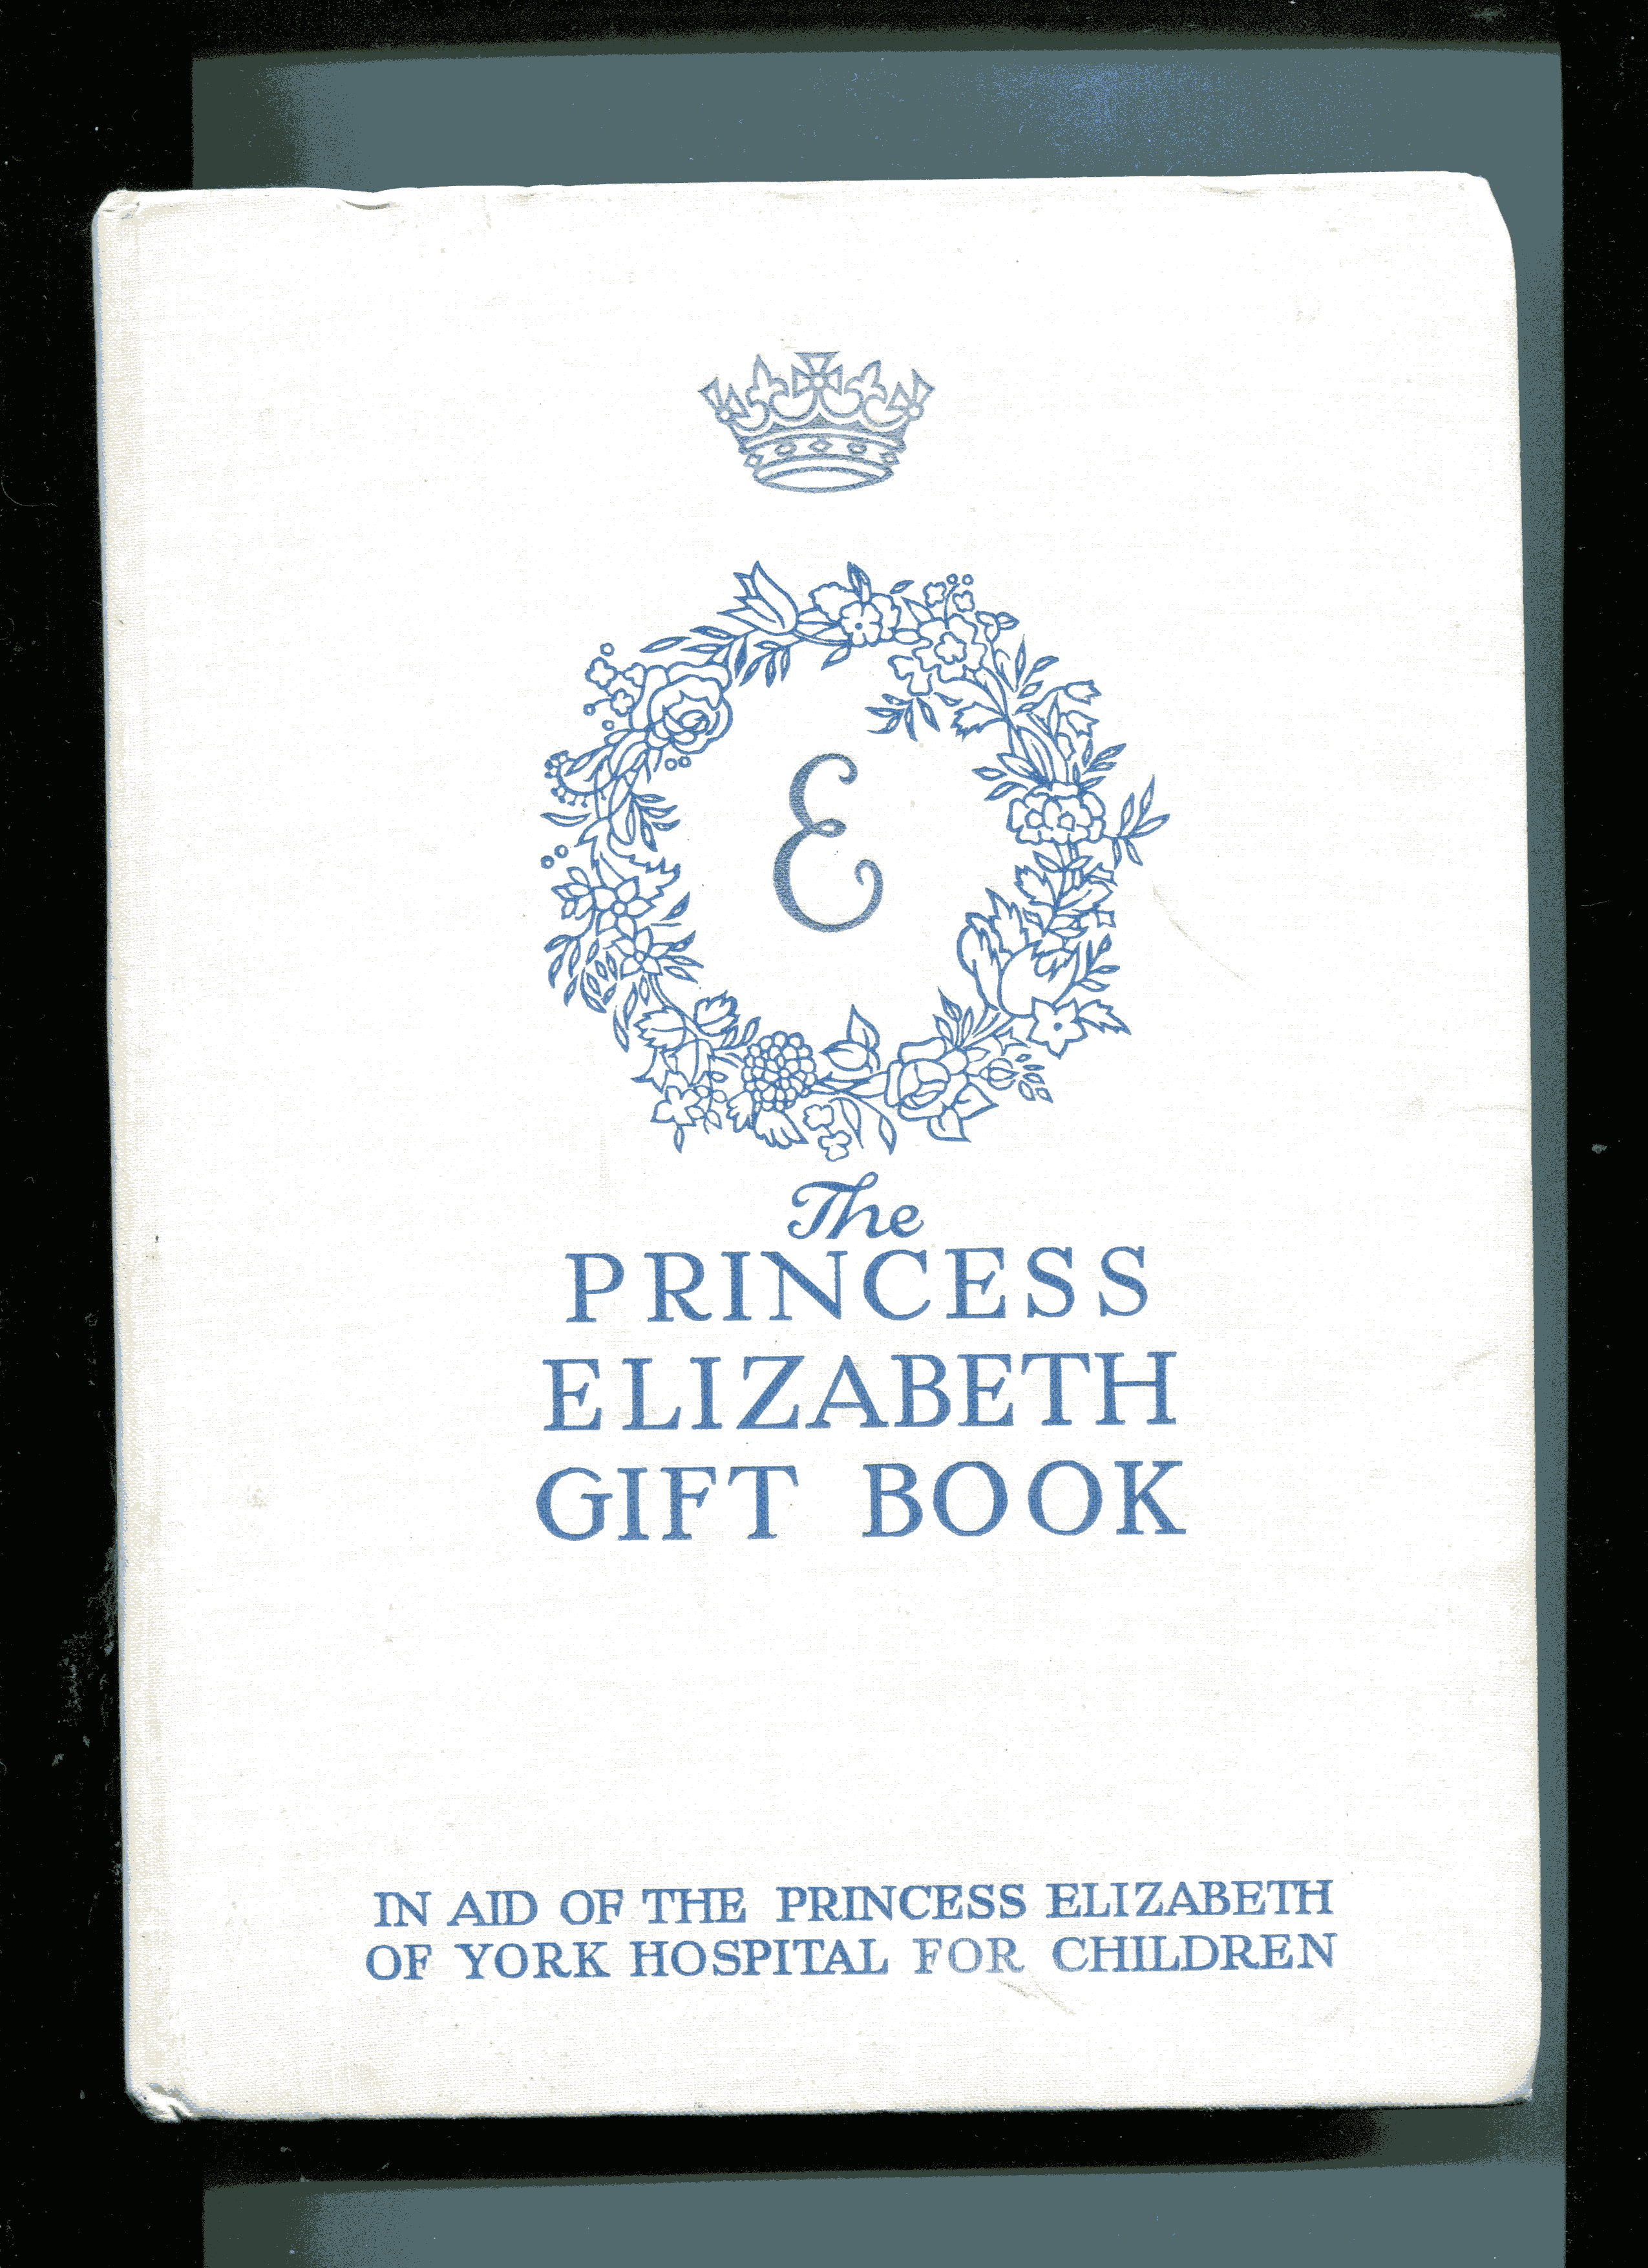 THE PRINCESS ELIZABETH GIFT BOOK: In Aid of the Princess Elizabeht of York Hospital for Children Asquith, Lady Cynthia & Bigland, Eileen, Eds Near Fi